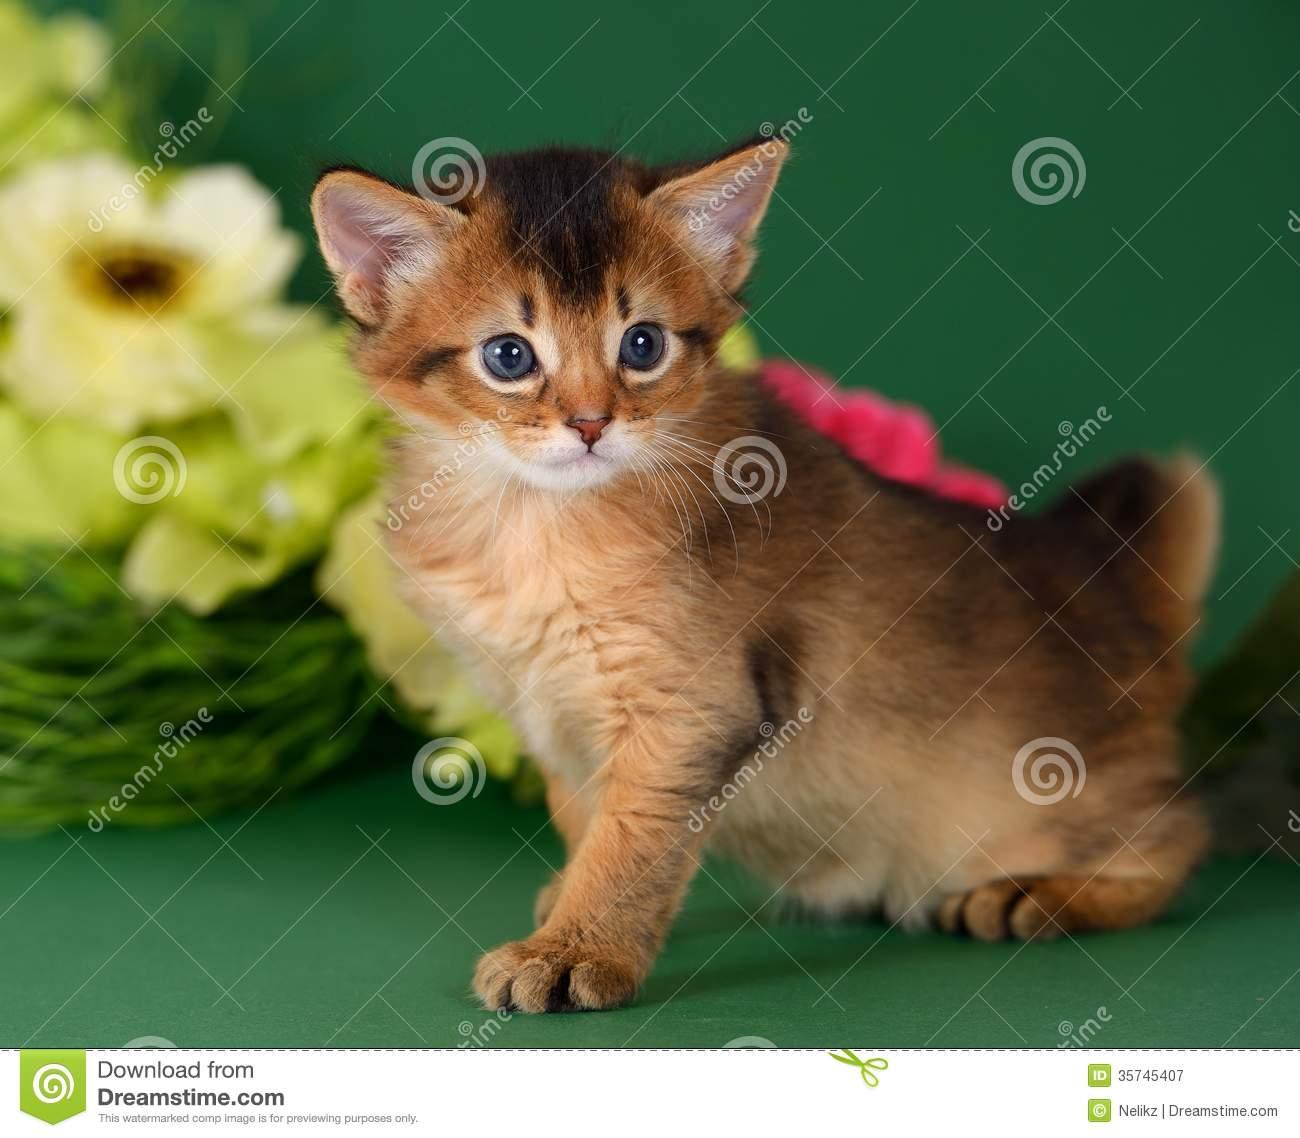 Somali Kitten: Somali Royalty Free Stock Graphy Cute Somali Kitten Green Background Flowers Breed